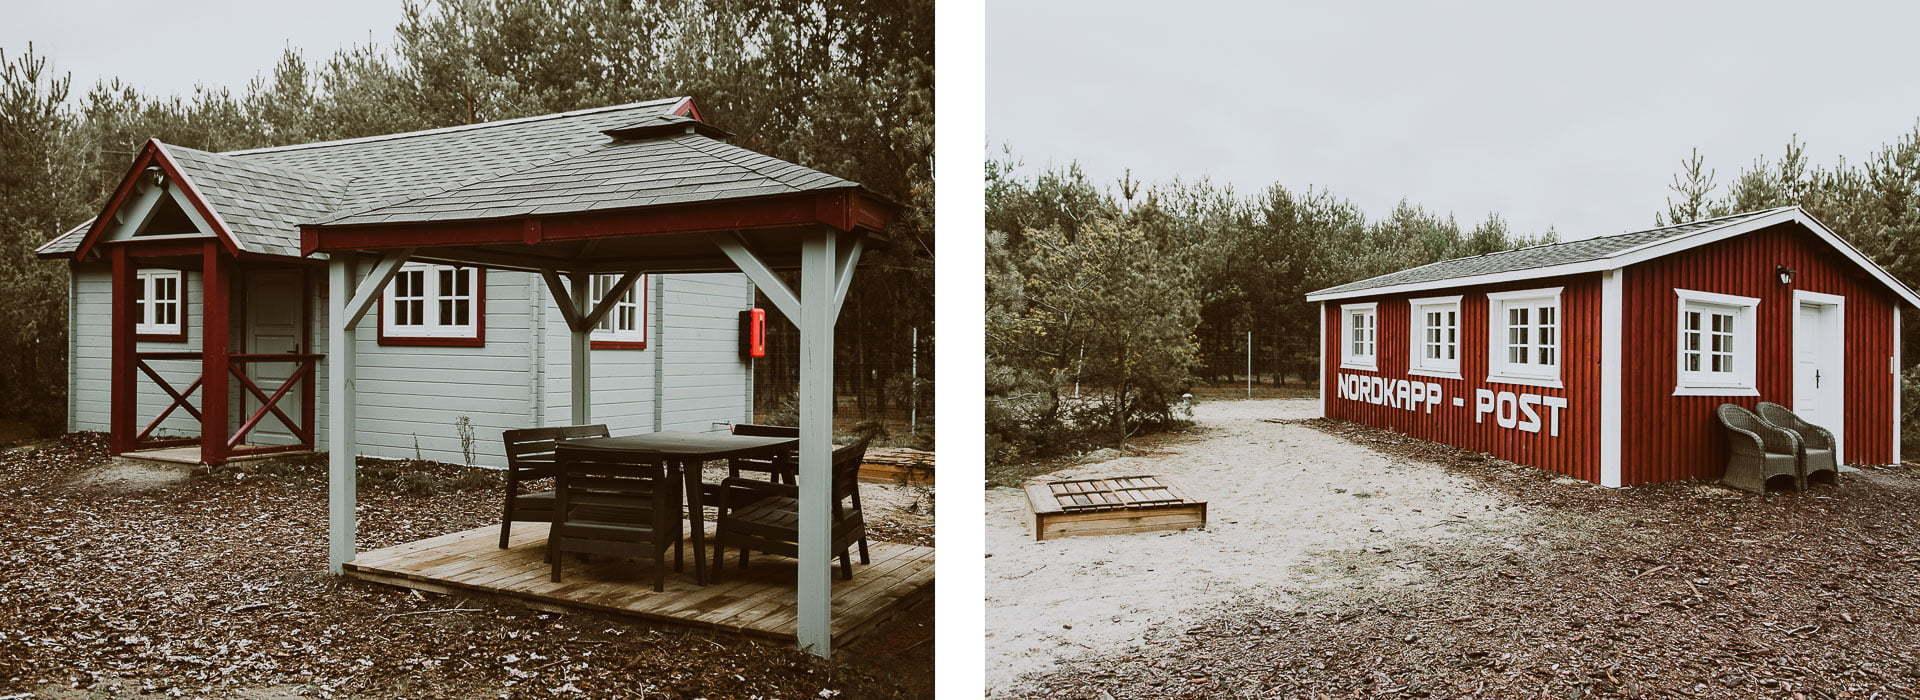 Arendel Wioska Norweska - domy